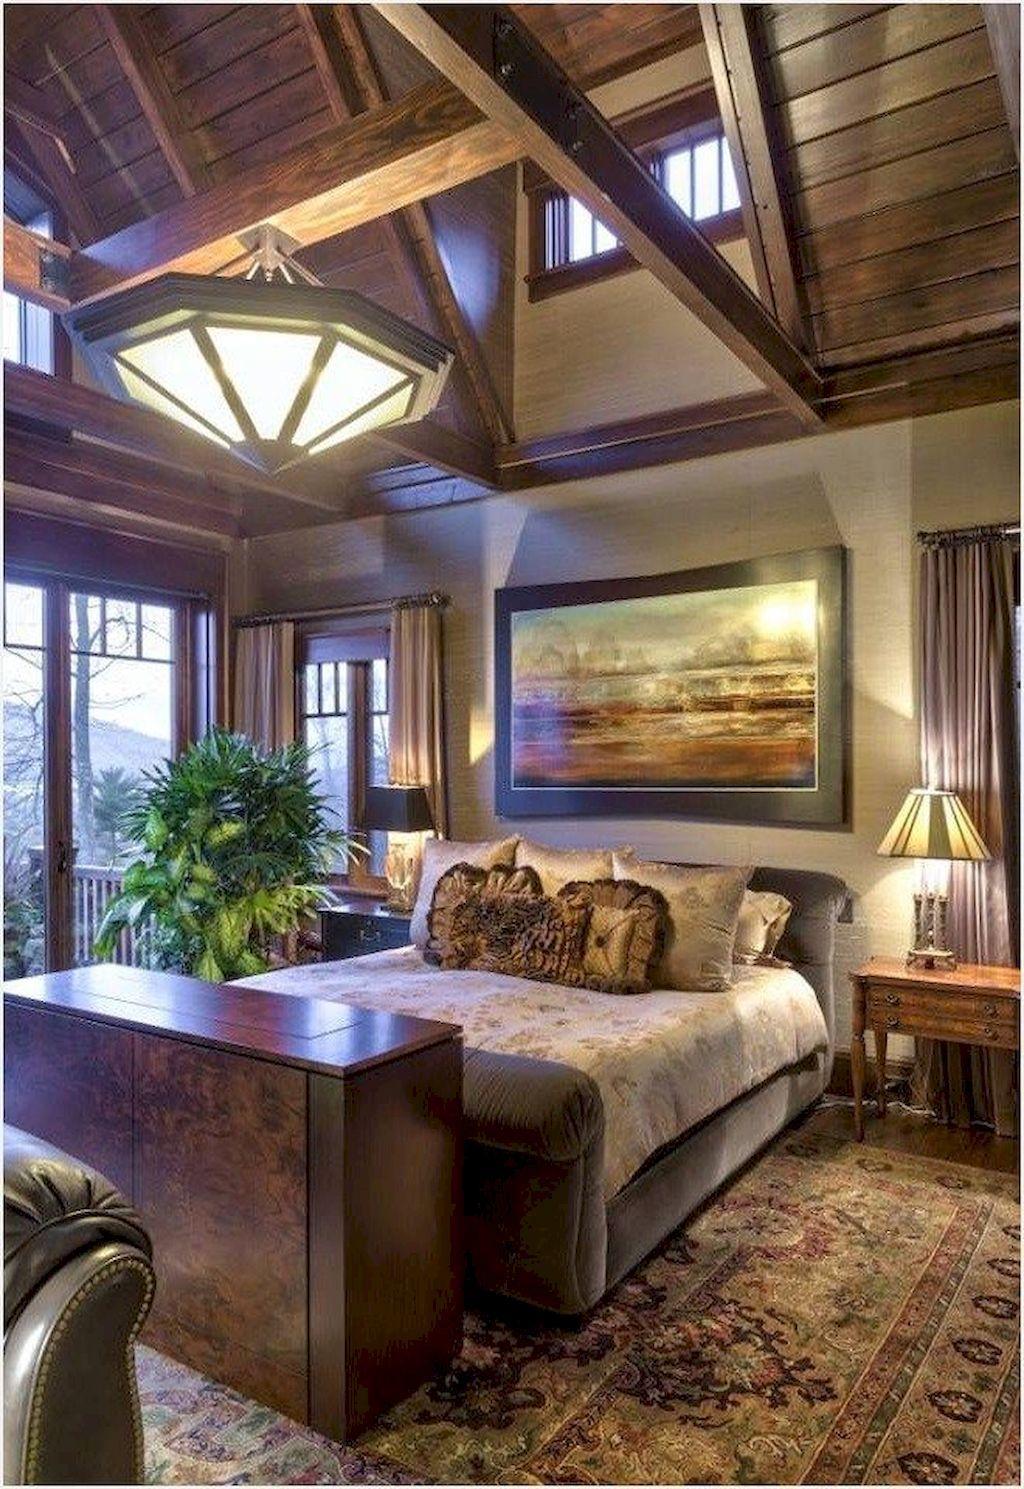 Rustic Romantic Bedroom Ideas: 200+ Fabulously Transform Bedroom Decor For Romantic